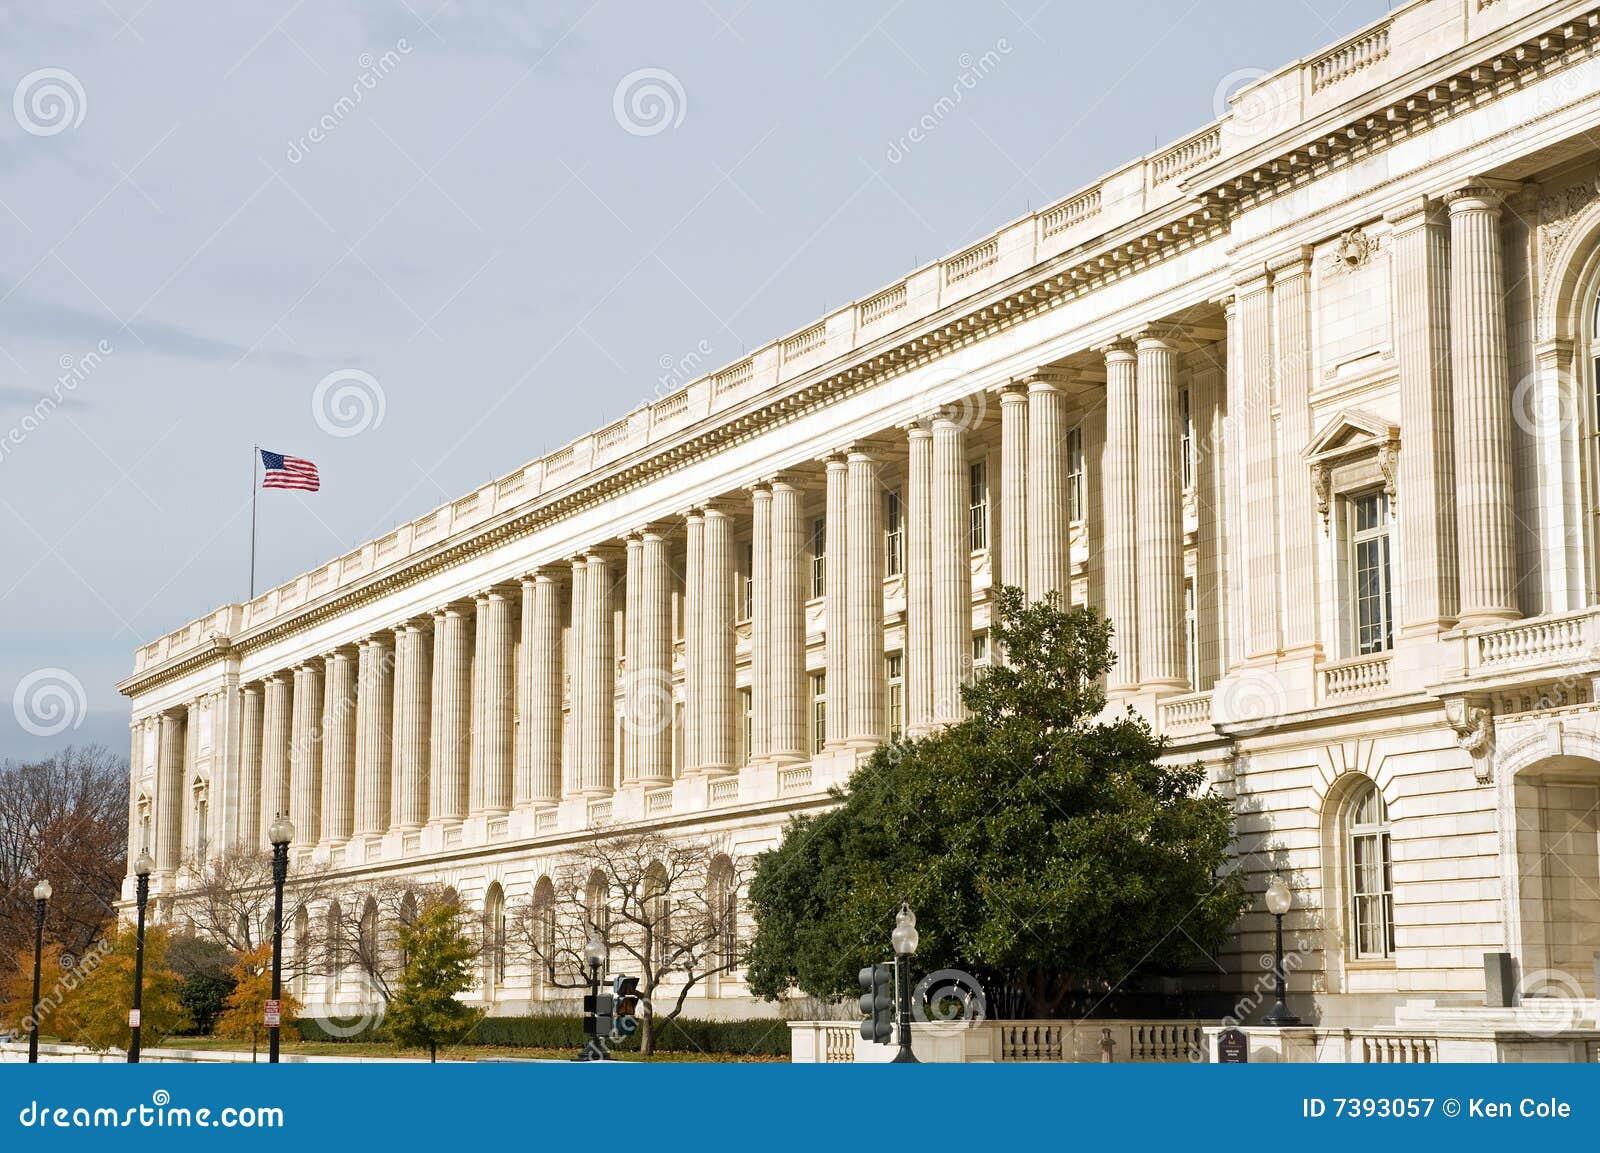 Washington State Senate Office Building